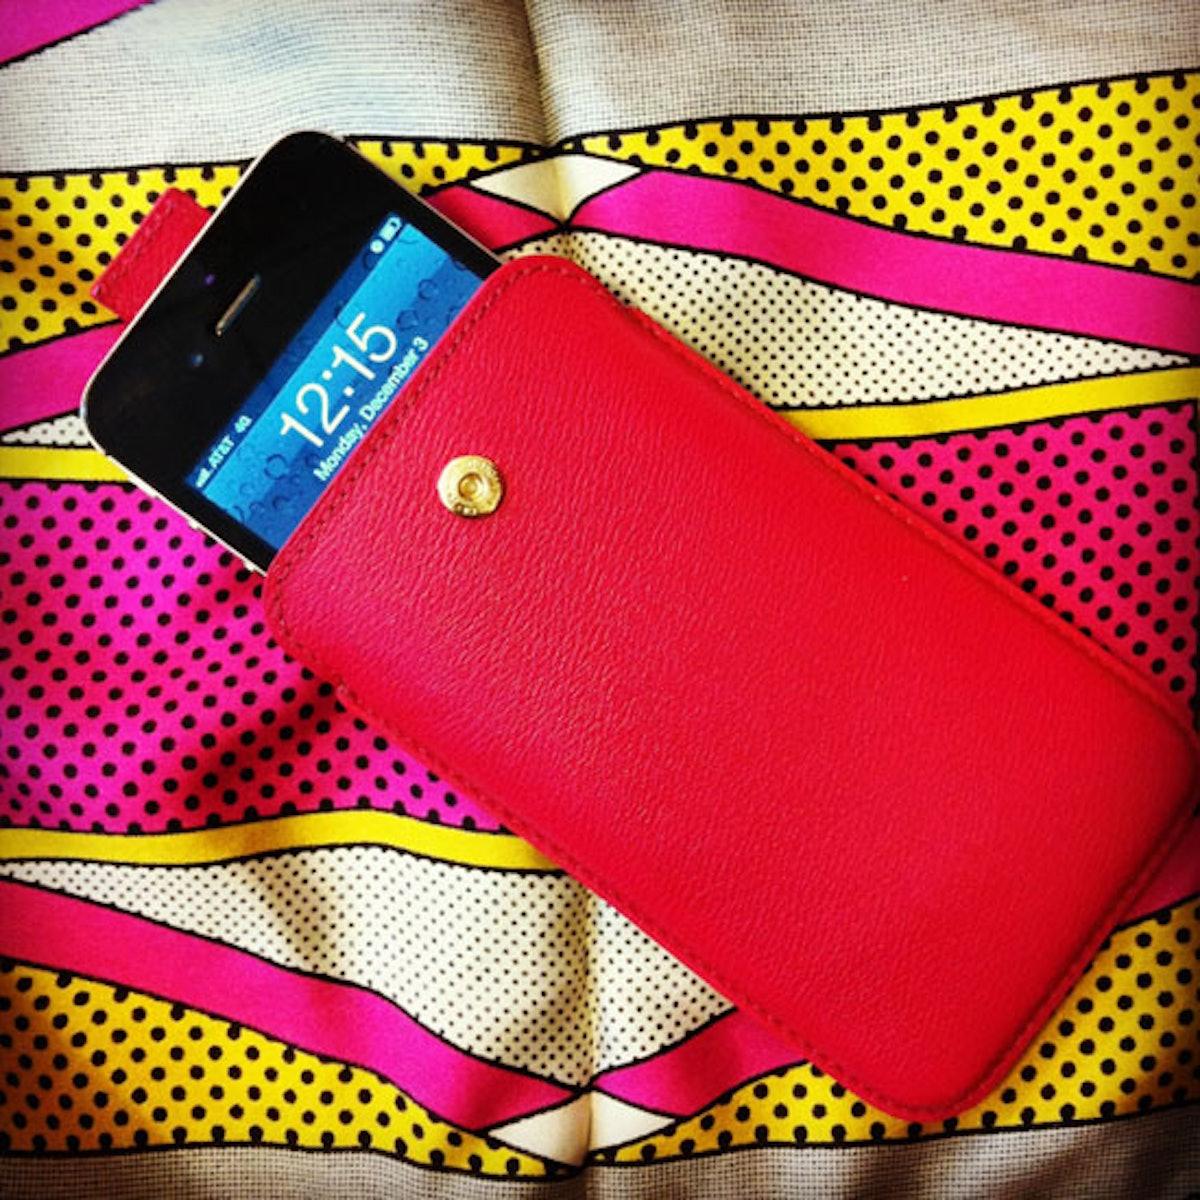 blog-smythson-iphone-case.jpg